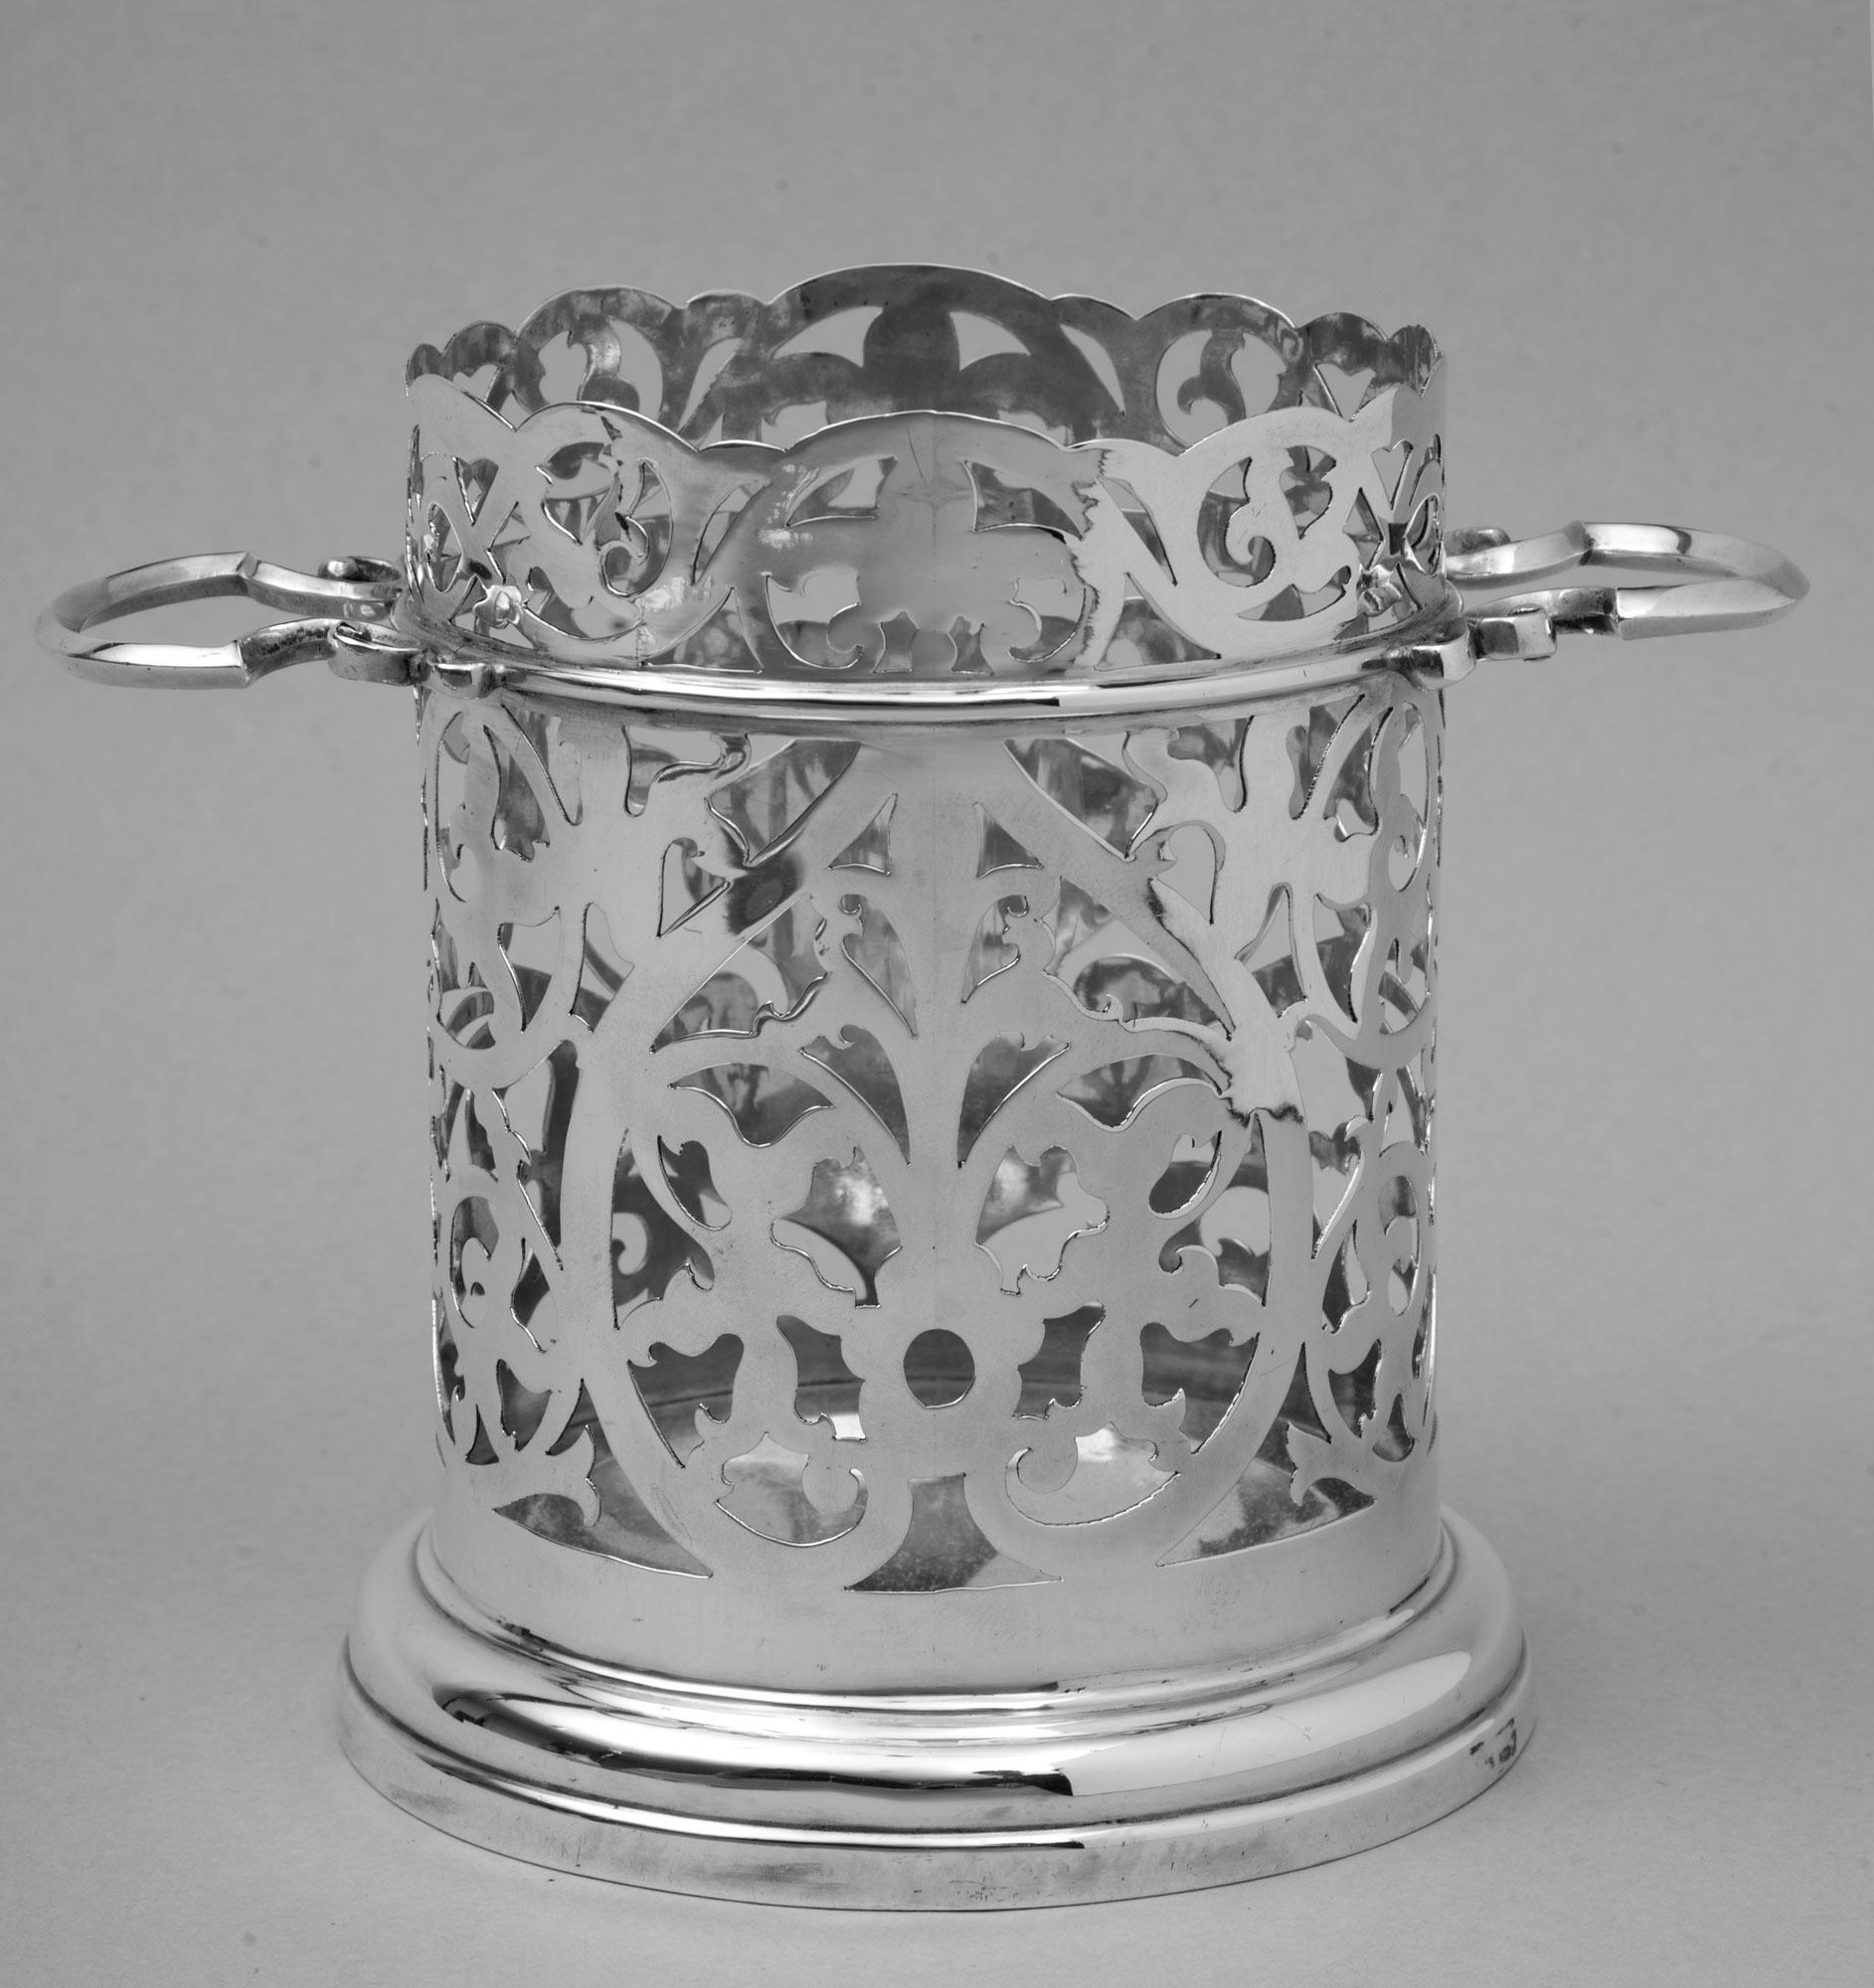 Antique Bottle Display: » Product » Antique English Sterling Silver Wine Bottle Holder